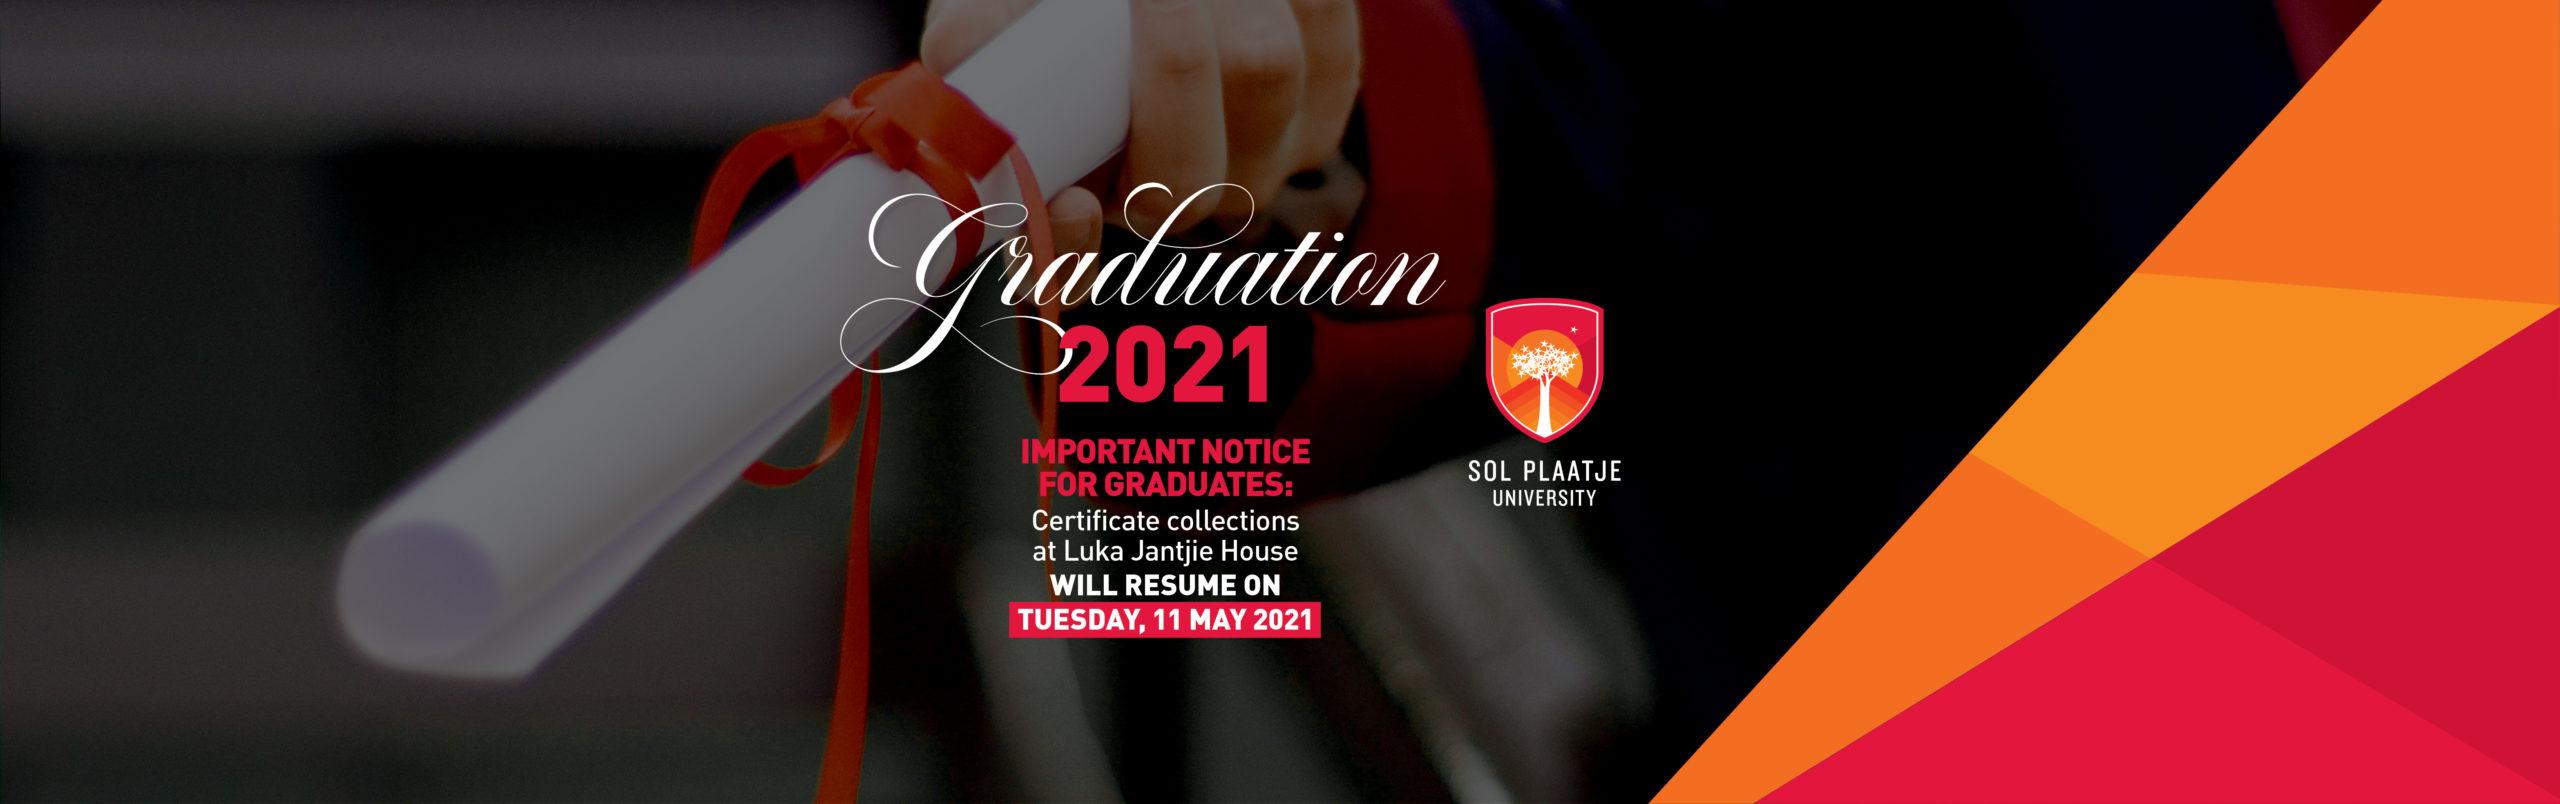 Important notice for graduands